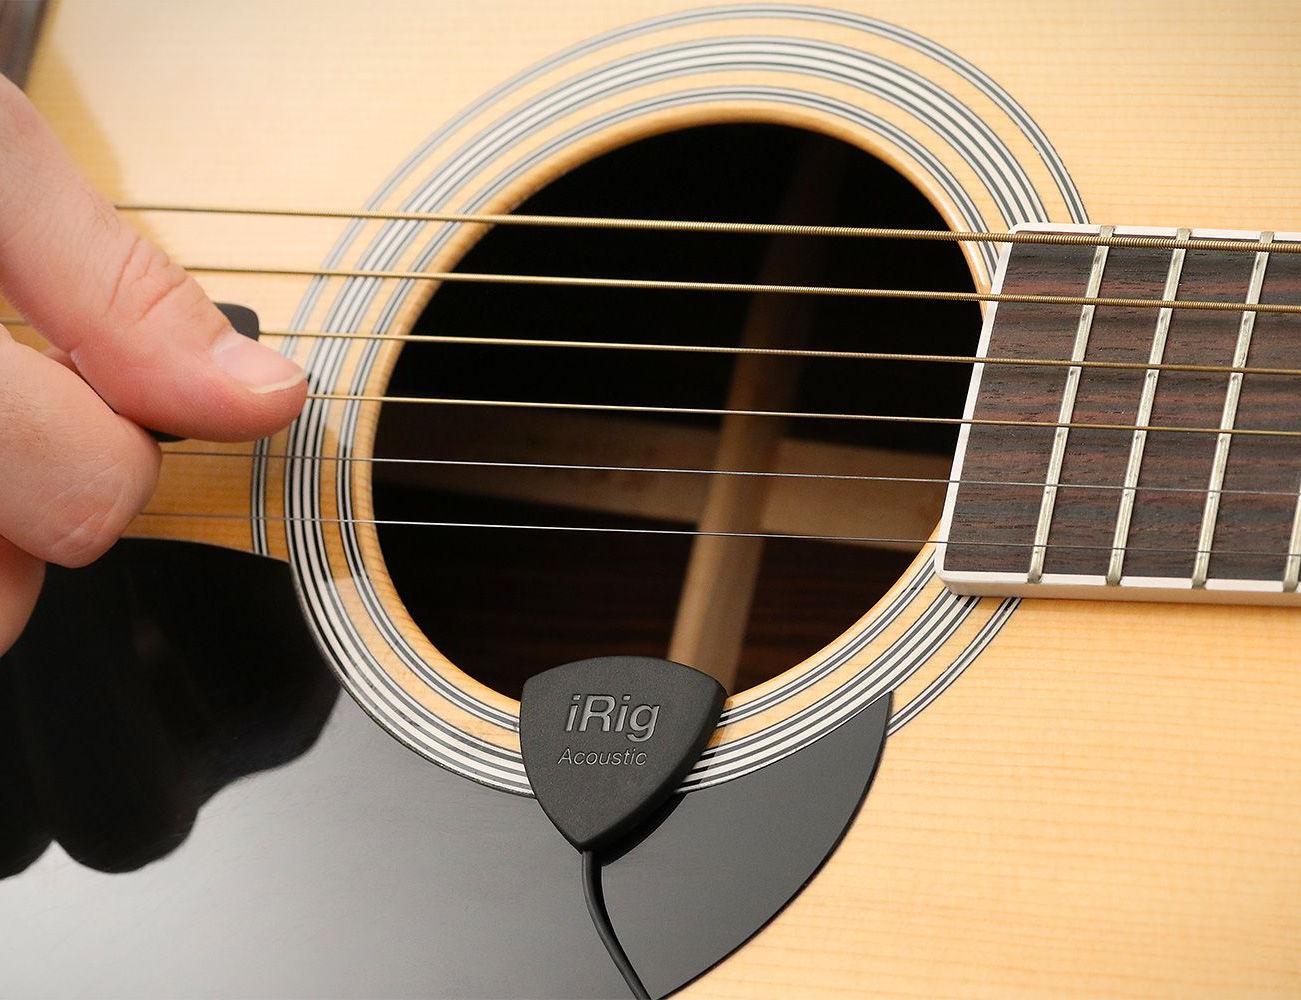 iRig Acoustic Guitar Microphone